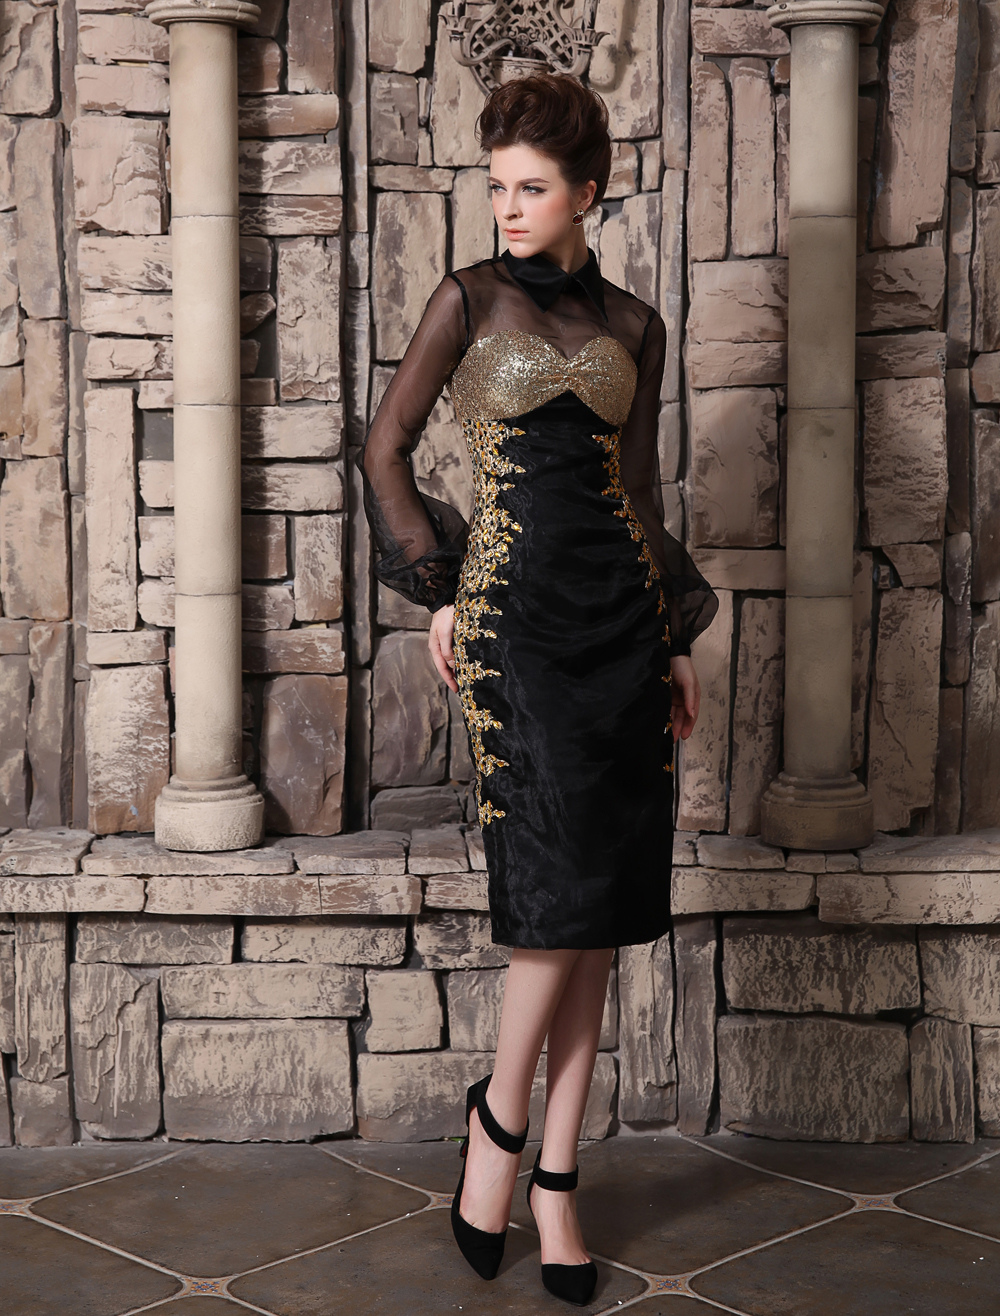 Black Beading Cowl Neck Long Sleeves Sheath Organza Cocktail Dress Wedding Guest Dress Milanoo (Cocktail Dresses) photo